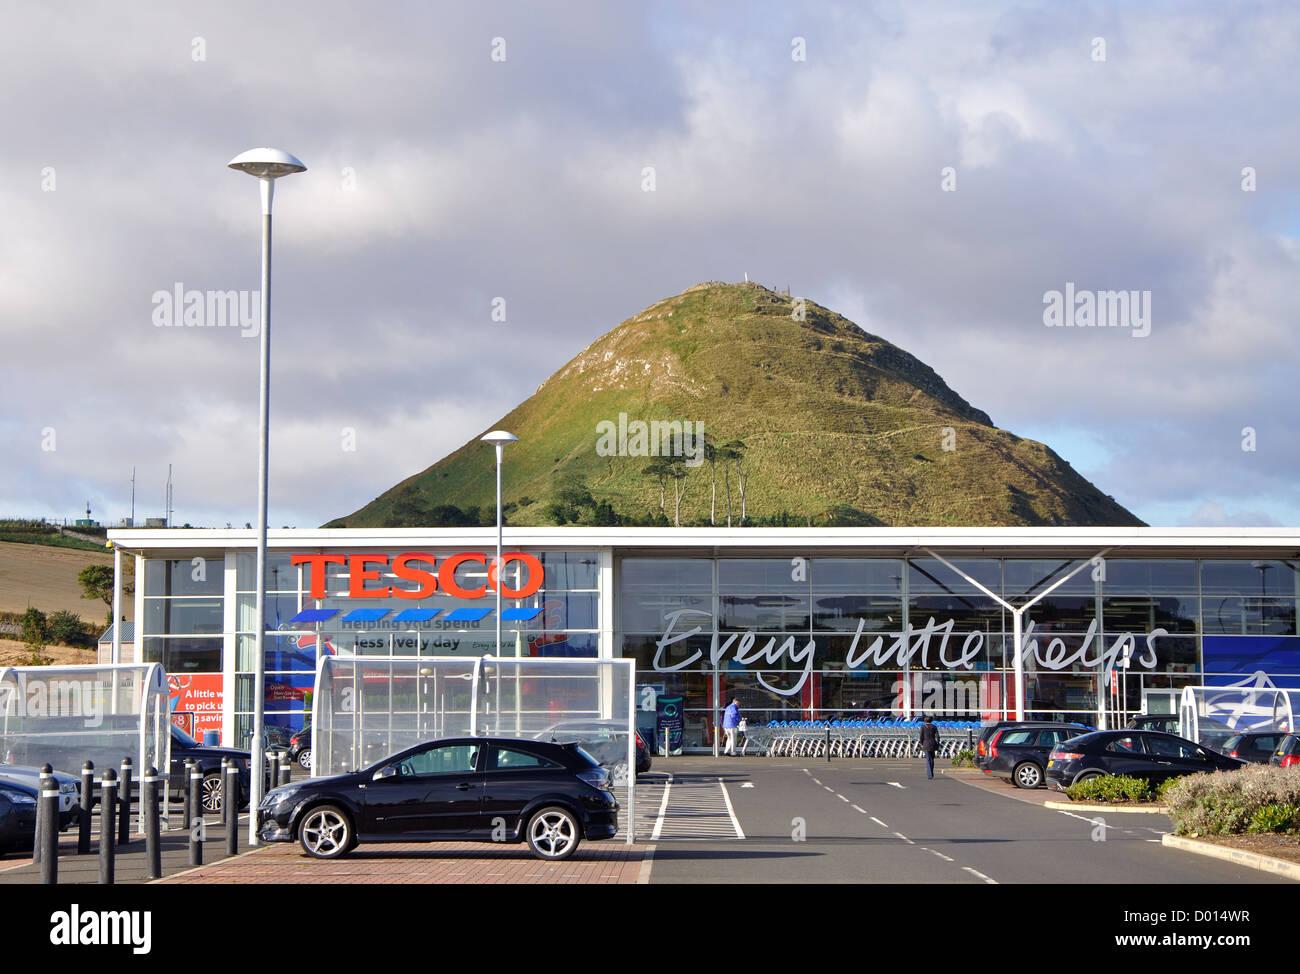 Tesco and North Berwick Law, North Berwick, East Lothian, Scotland, UK Stock Photo